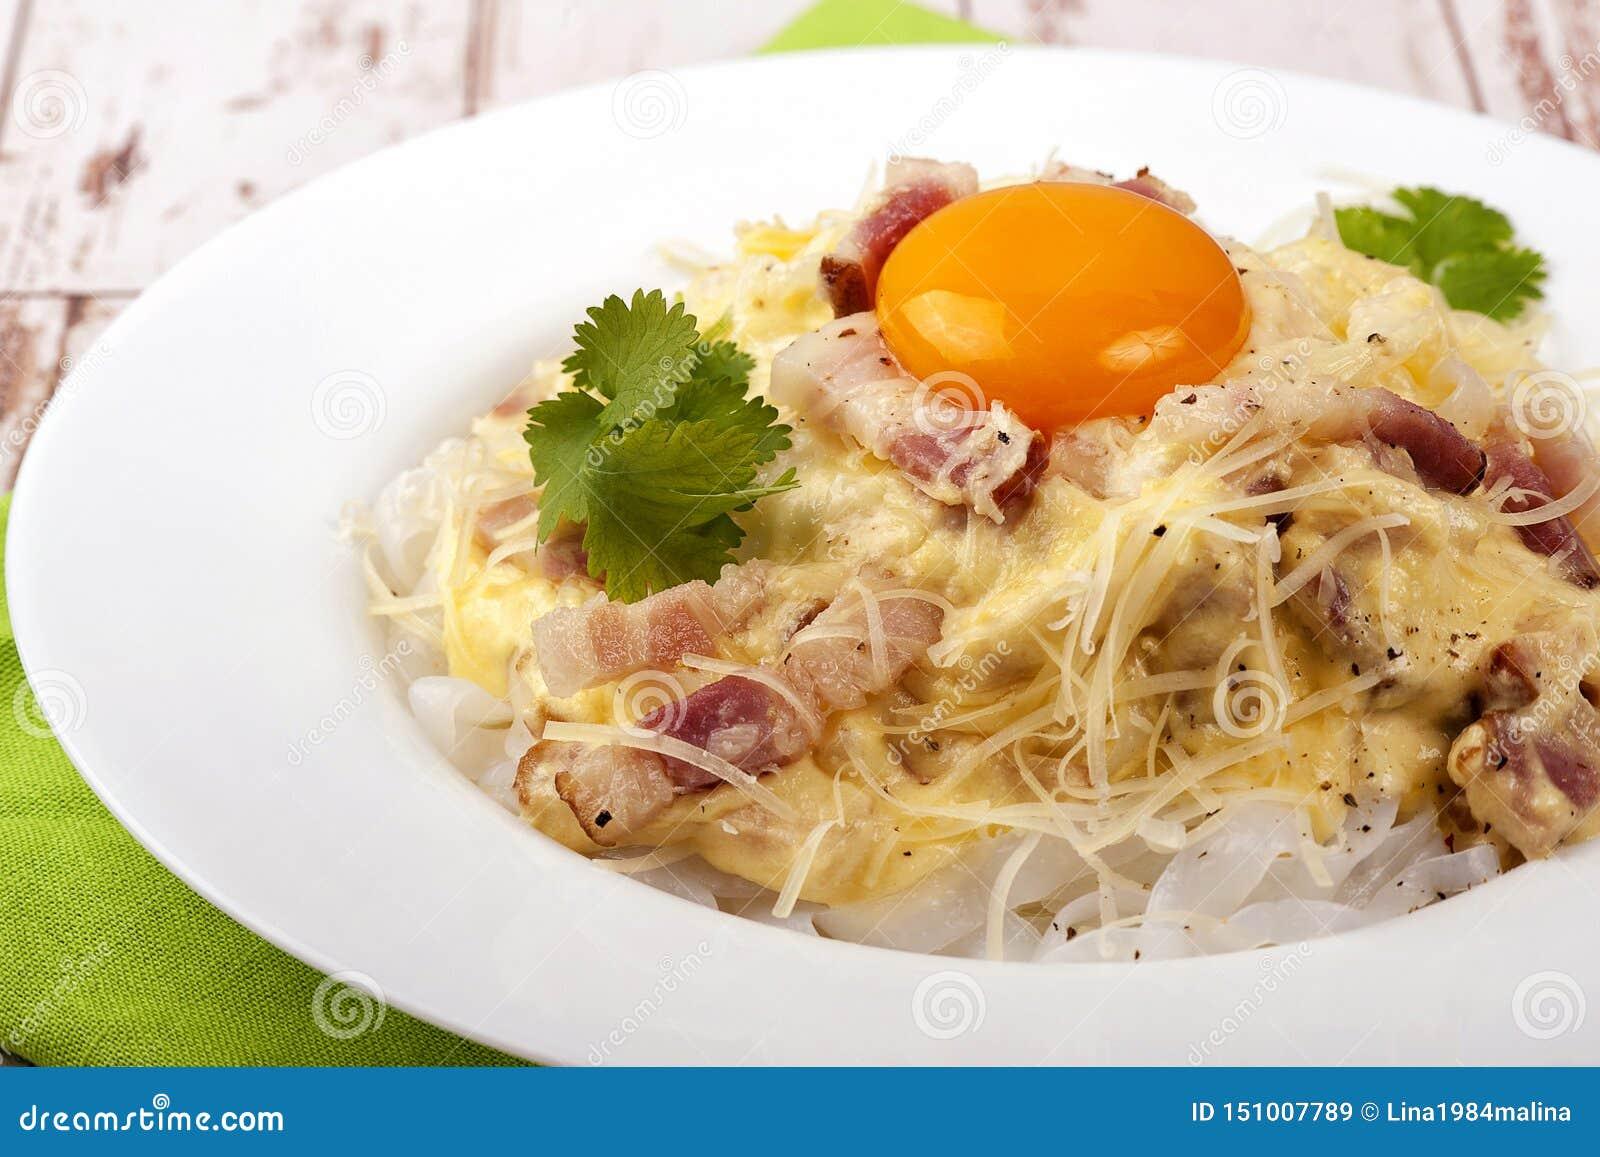 Traditional dish of Italian cuisine carbonara